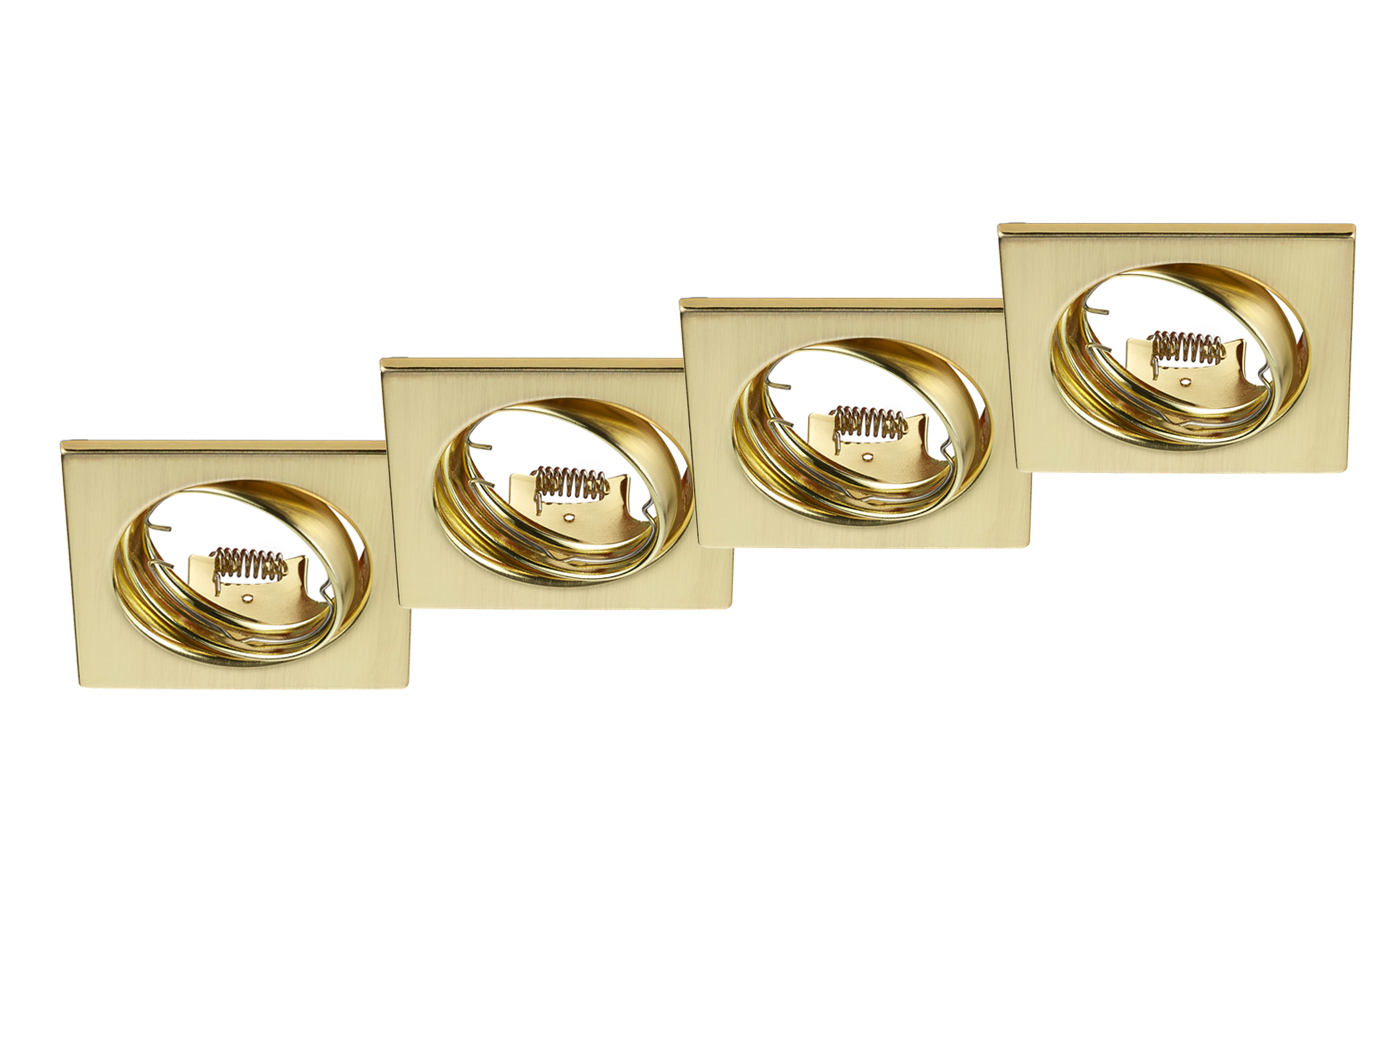 4 instalación lámparas LED mantas spot cuadrada 8x8 cm escalera orientable escalera cm iluminación 37e5fe